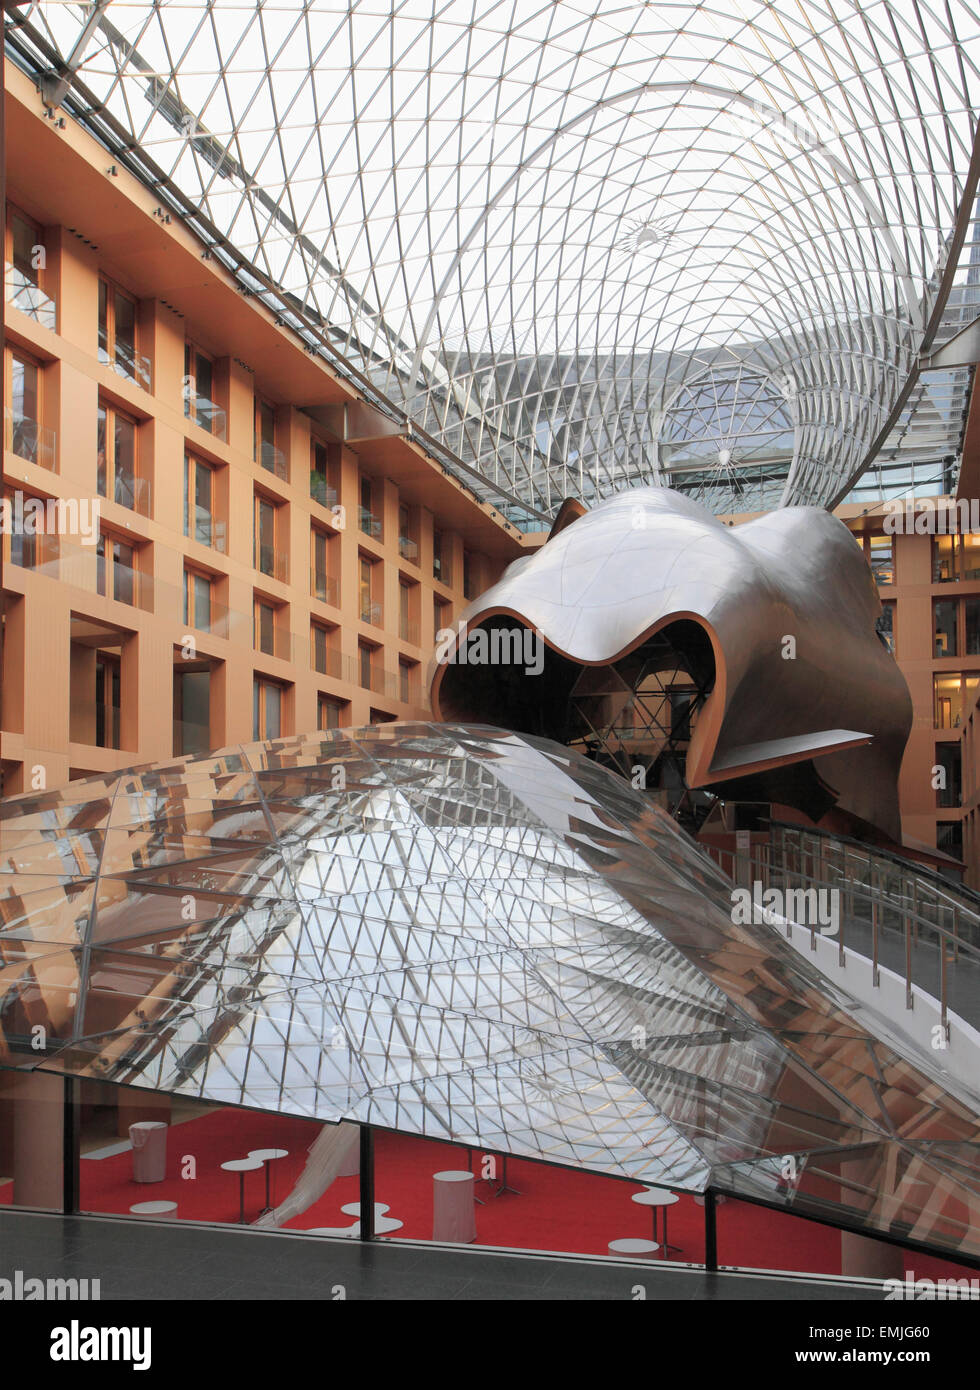 Germany, Berlin, DZ Bank, Atrium, Frank Gehry architect, - Stock Image